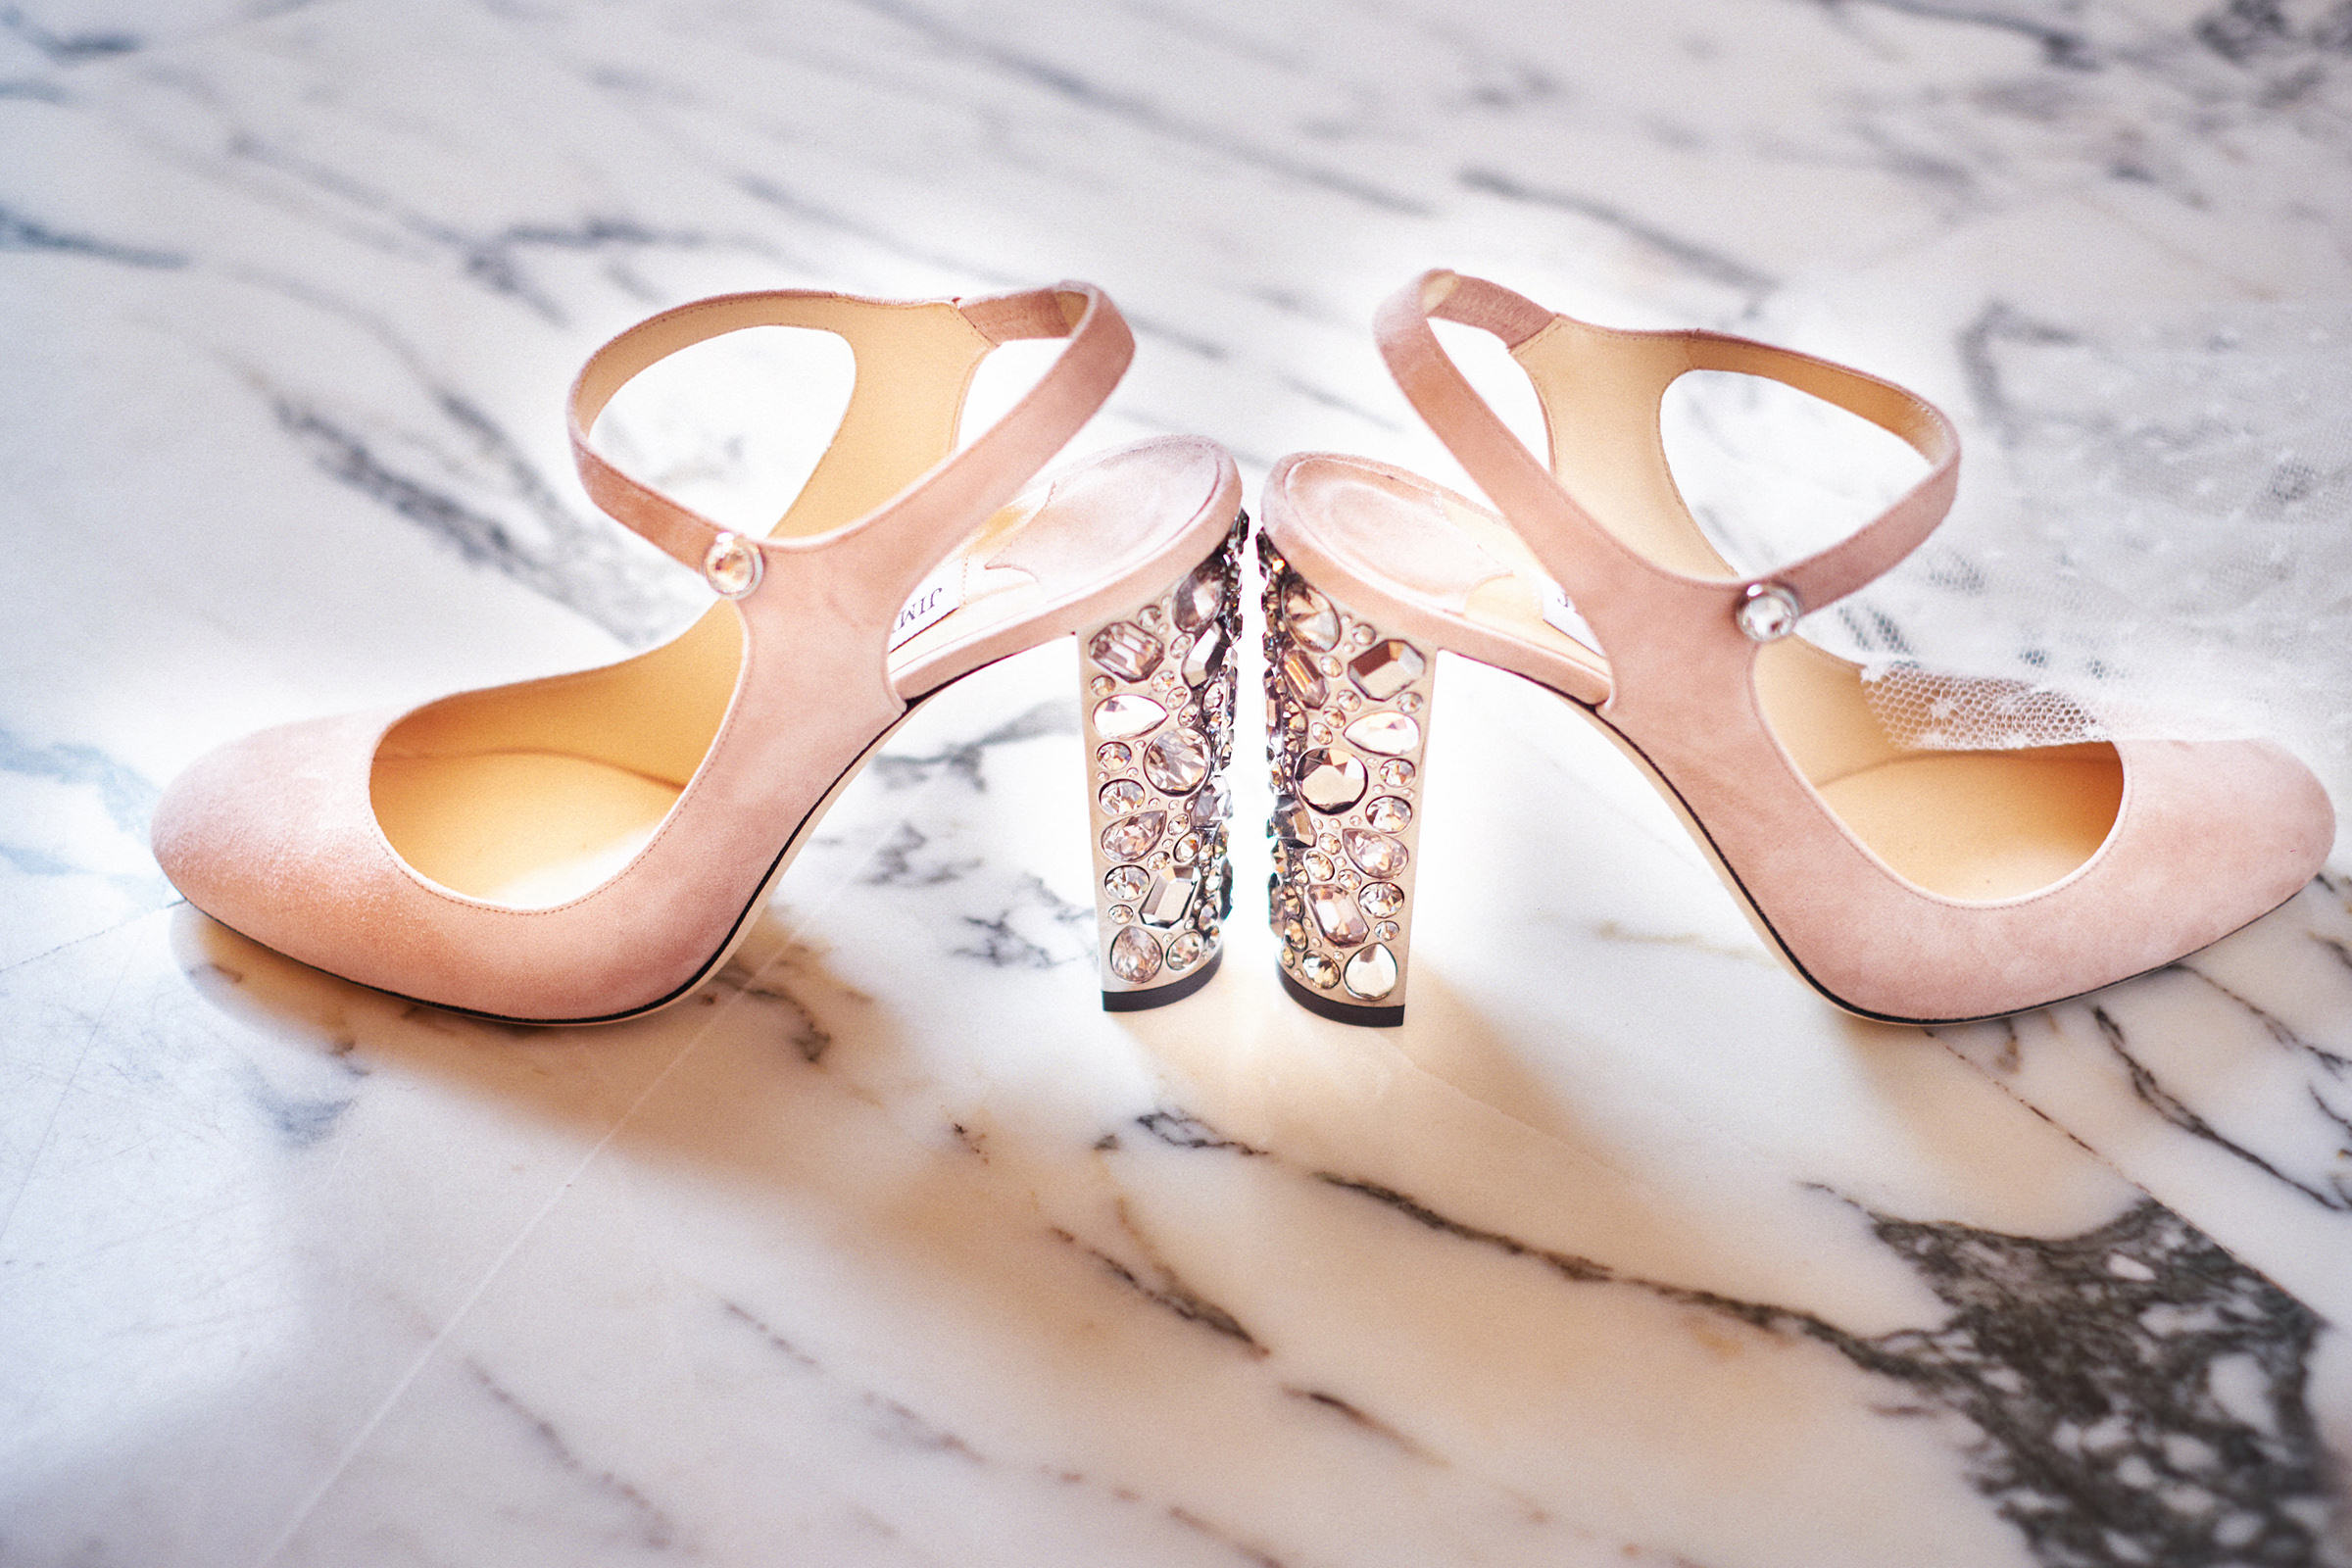 choo-bridal-shoes-detail-andrea-bagnasco-fotografie